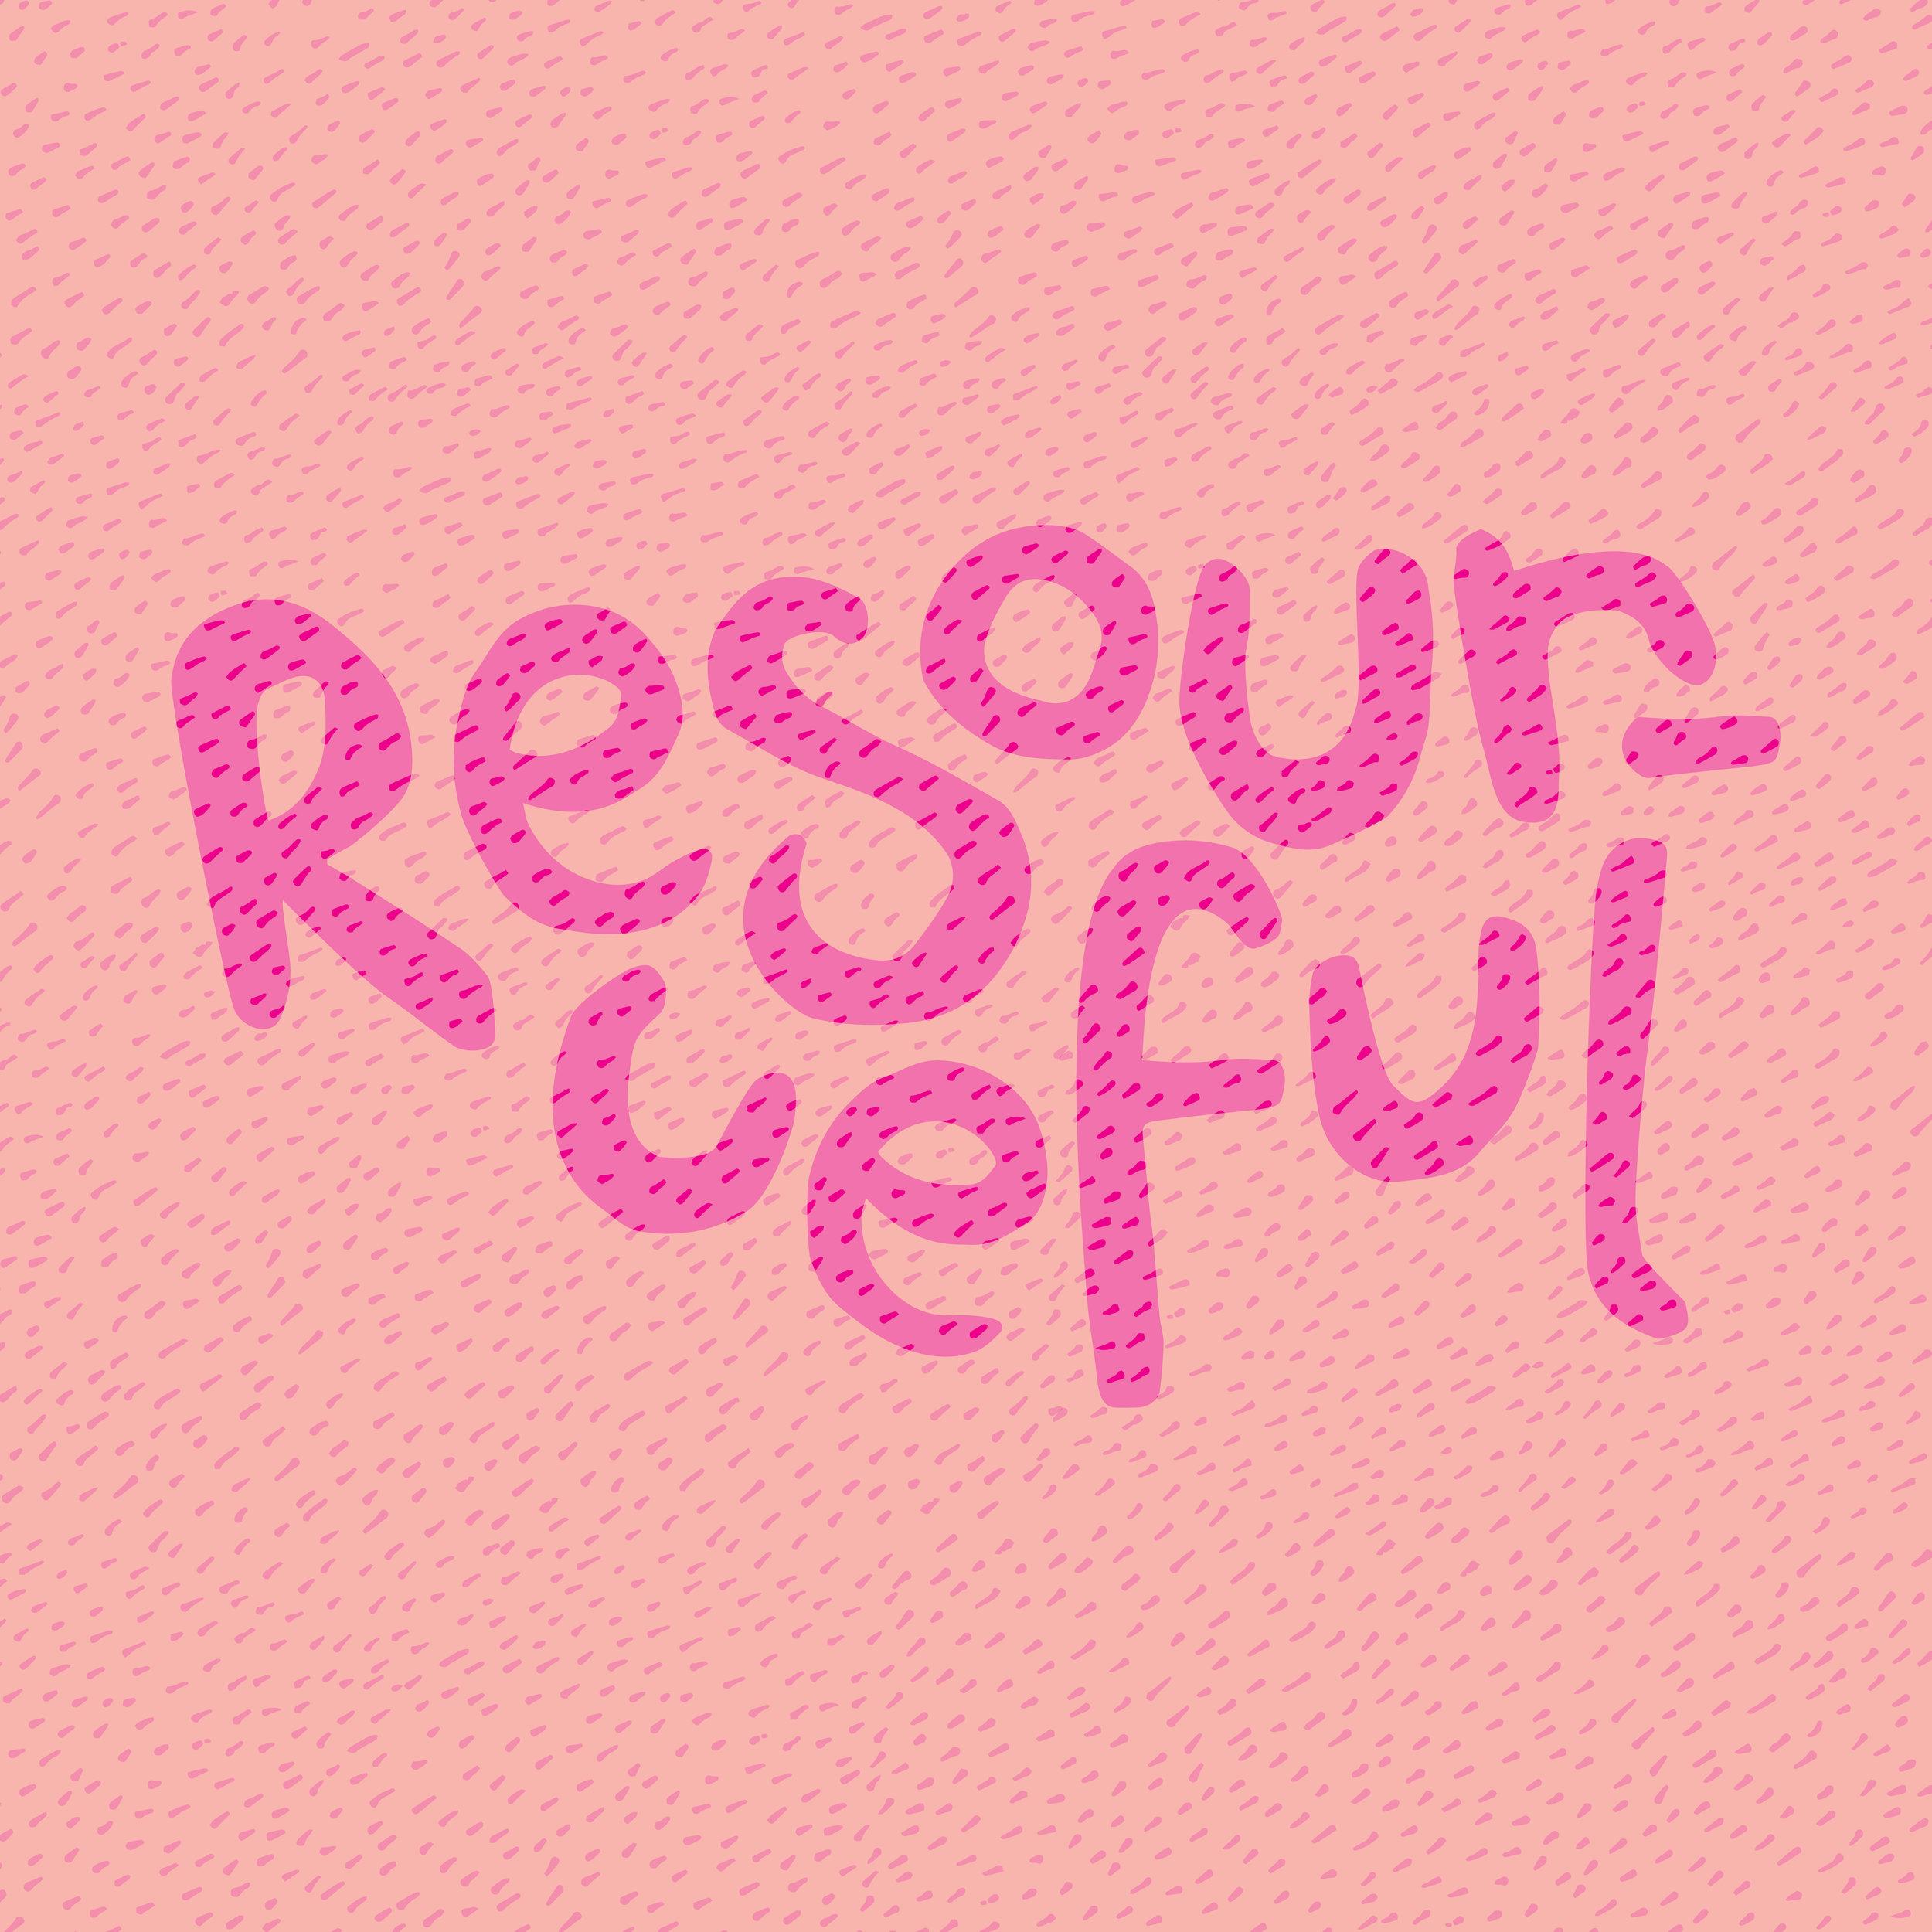 resourceful-01.jpg